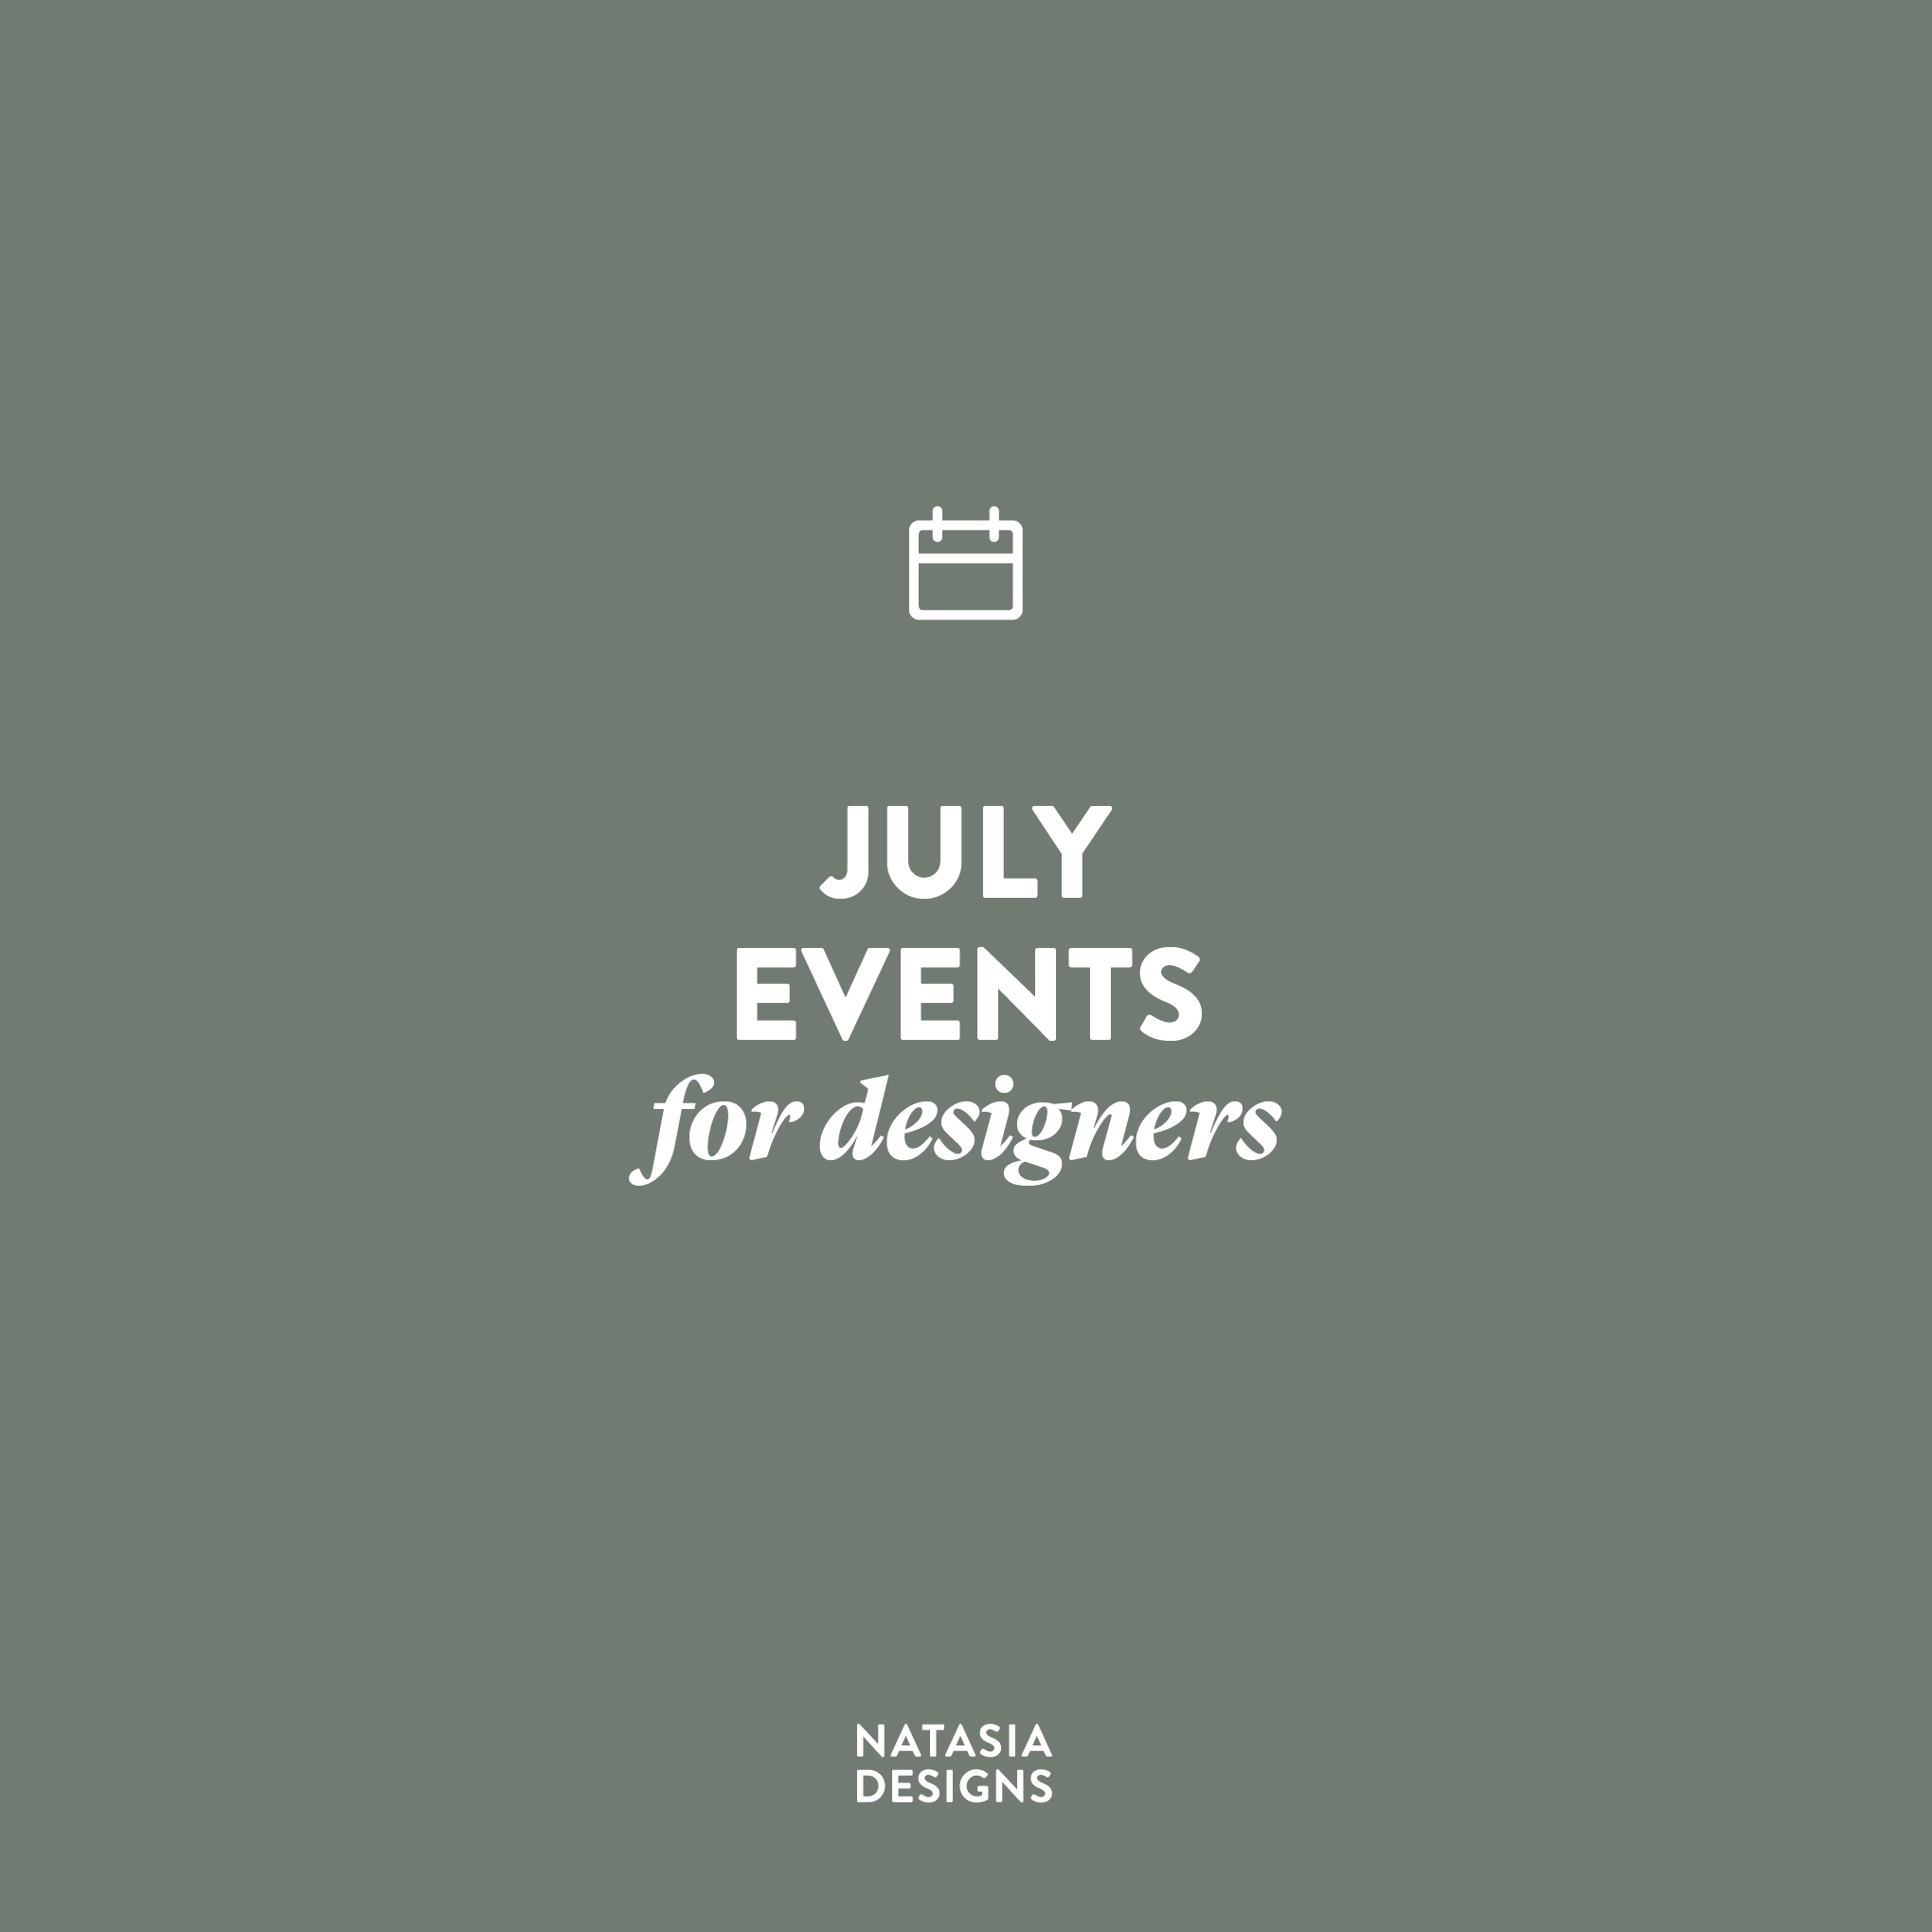 NatasiaDesigns_BlogPost_EventsJuly-01.jpg